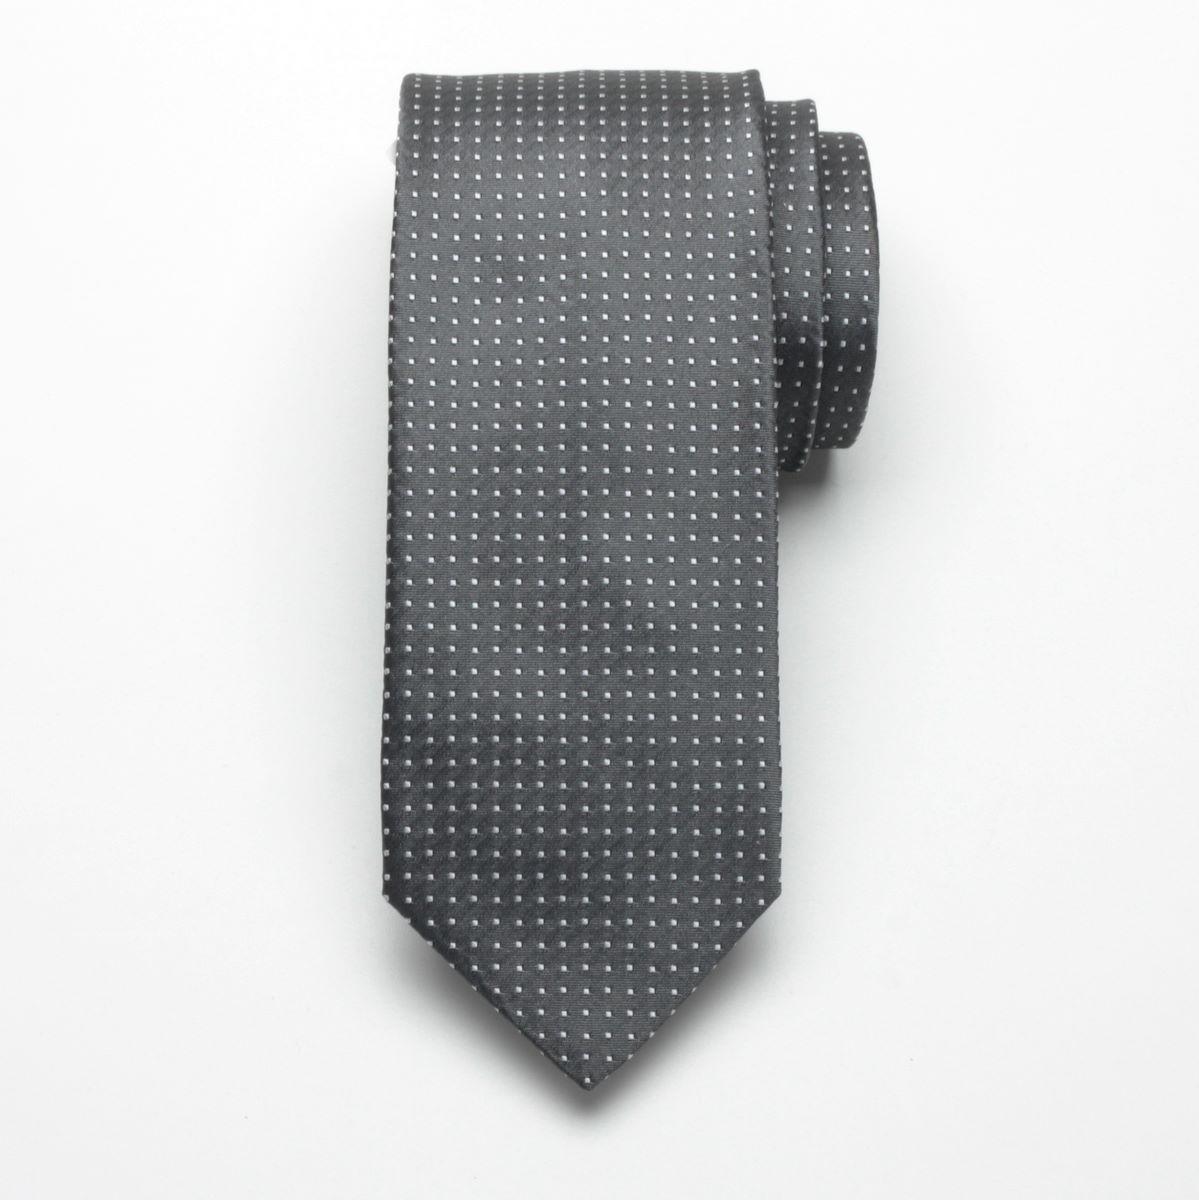 Krawat jedwabny Fine Selection (wzór 74)